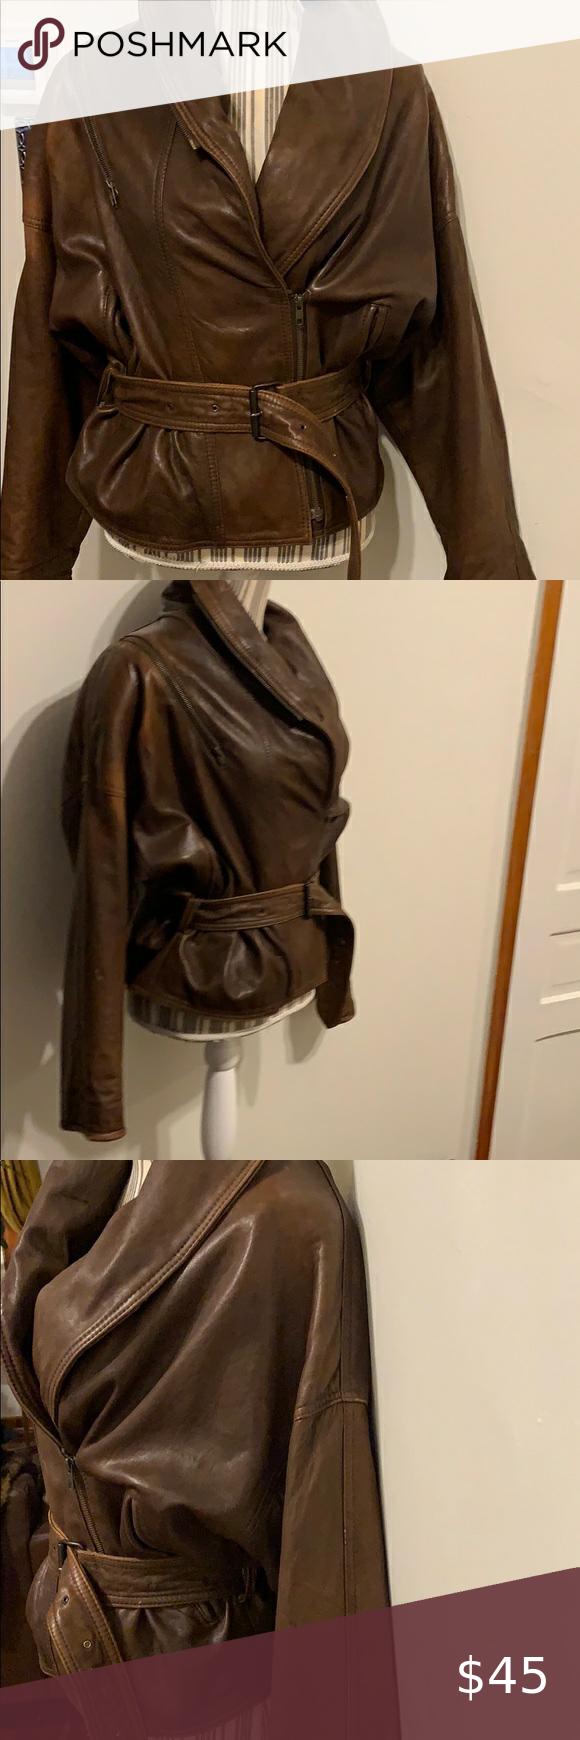 Brown Vintage Leather Jacket Leather Jacket Vintage Leather Jacket Jackets